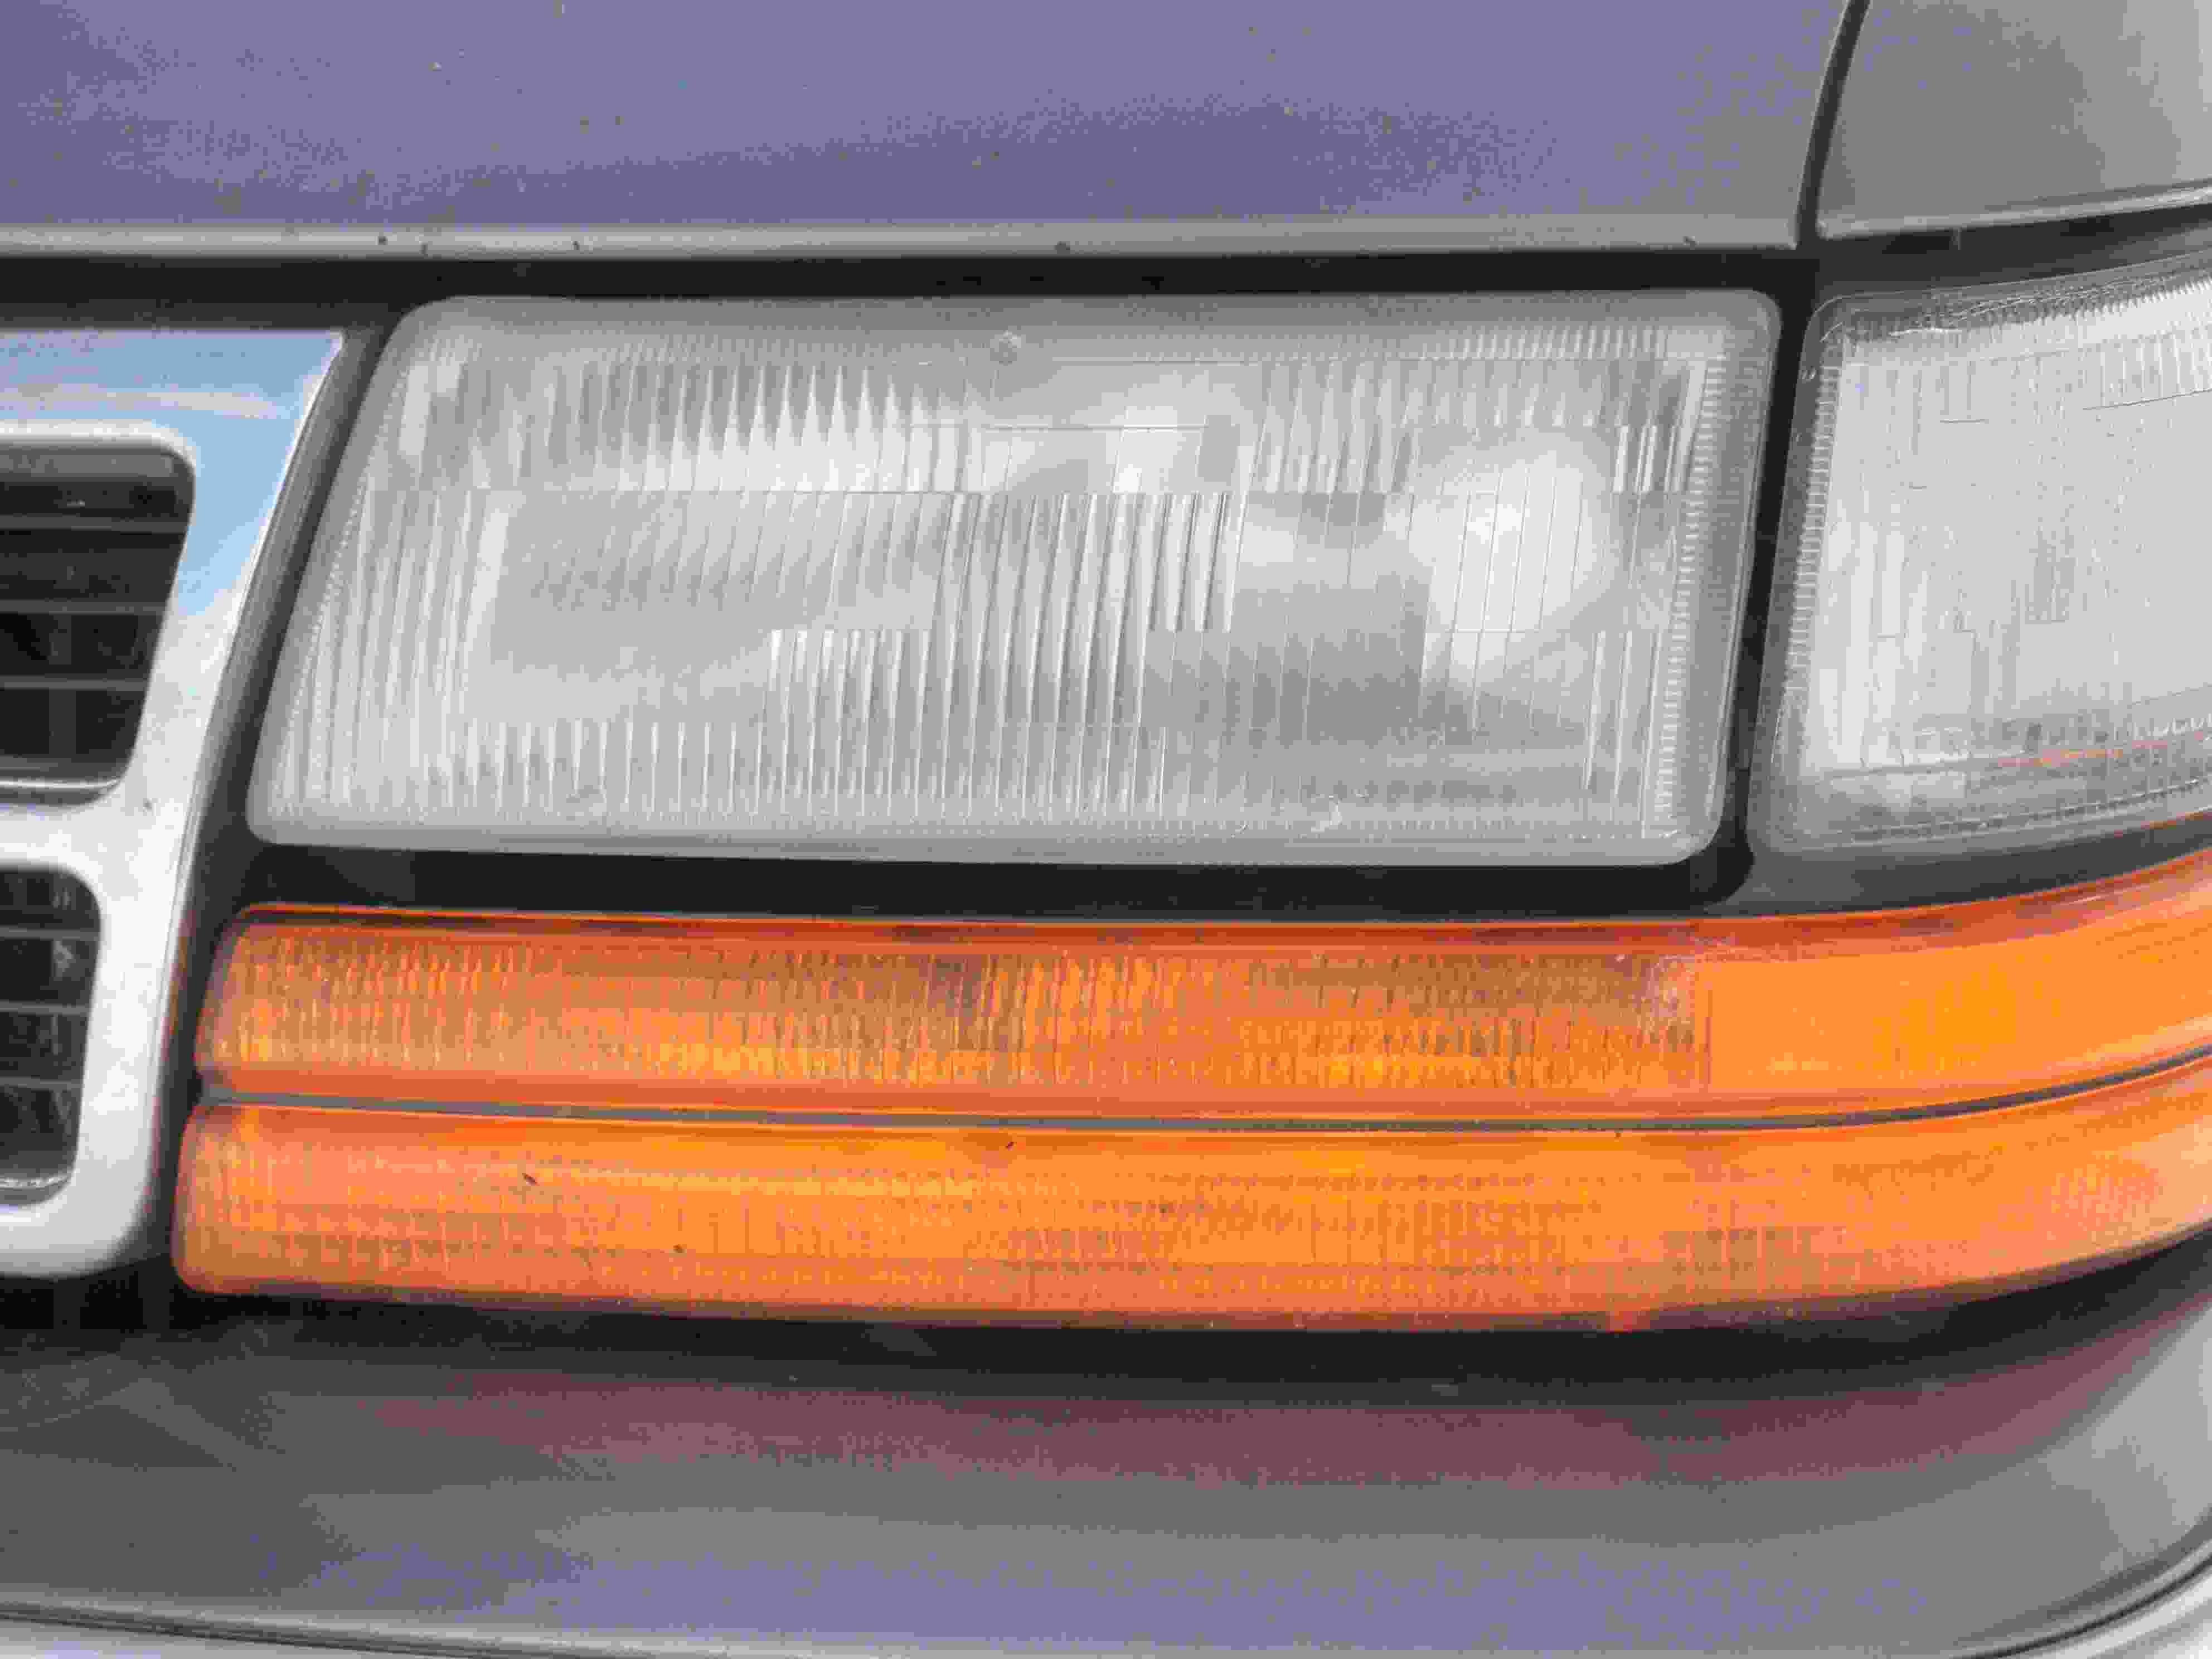 How to remove the haze from your headlight.-headlight-haze-004.jpg